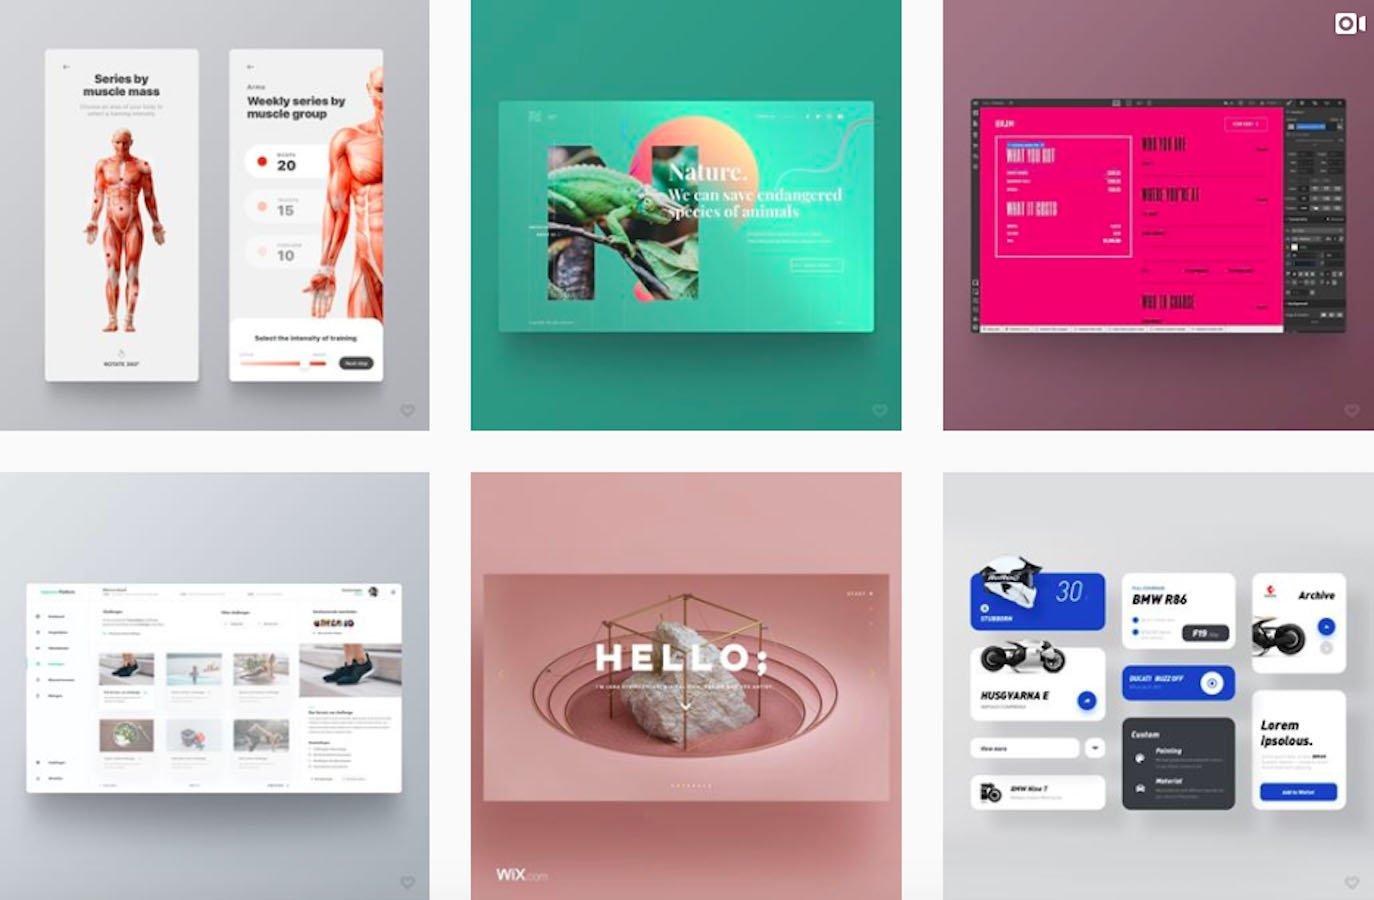 Web Design Inspiration: 110+ Accounts On Instagram and 10+ Best UX & Web Design Books in 2020 - welovewebdesign